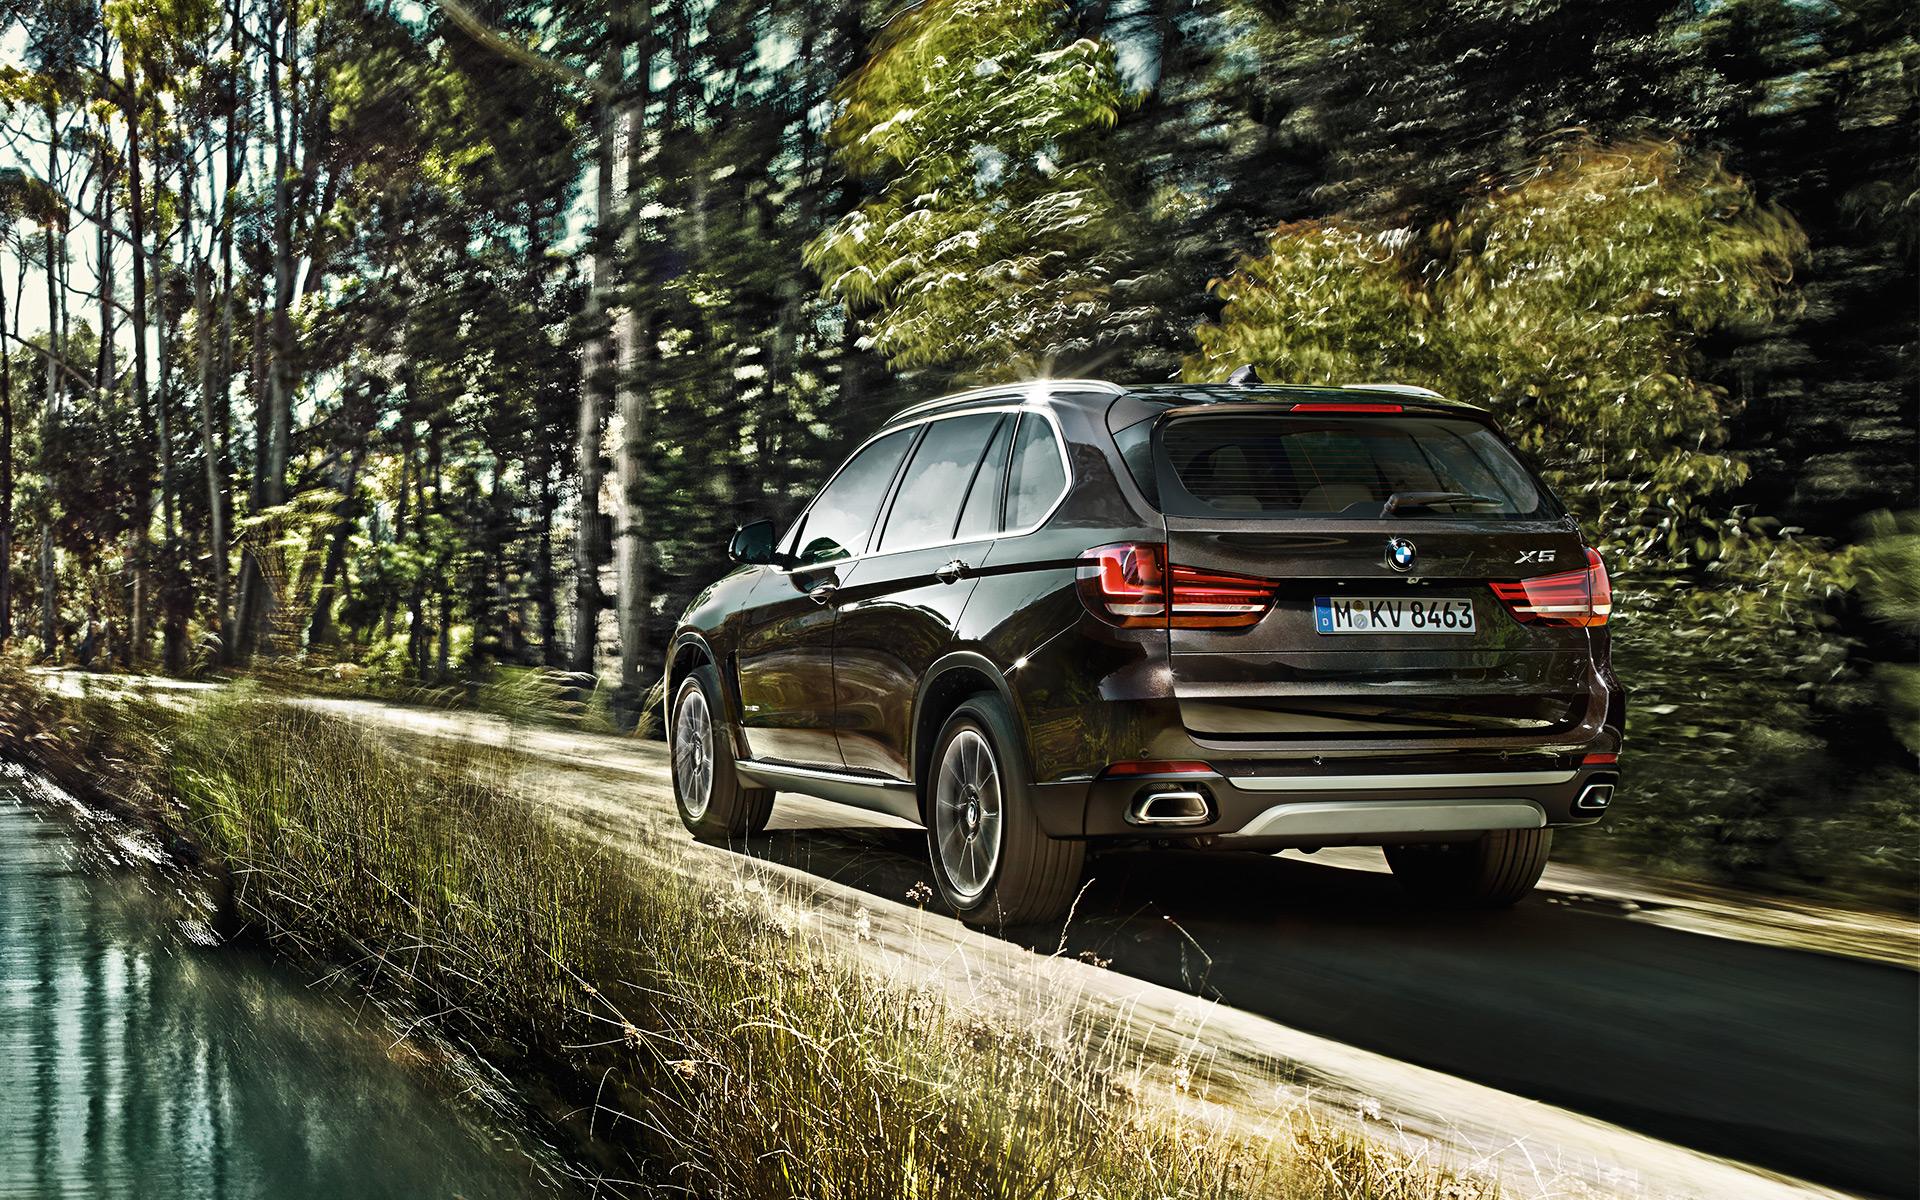 2014 BMW X5 (F15) - Official Thread - Information ...